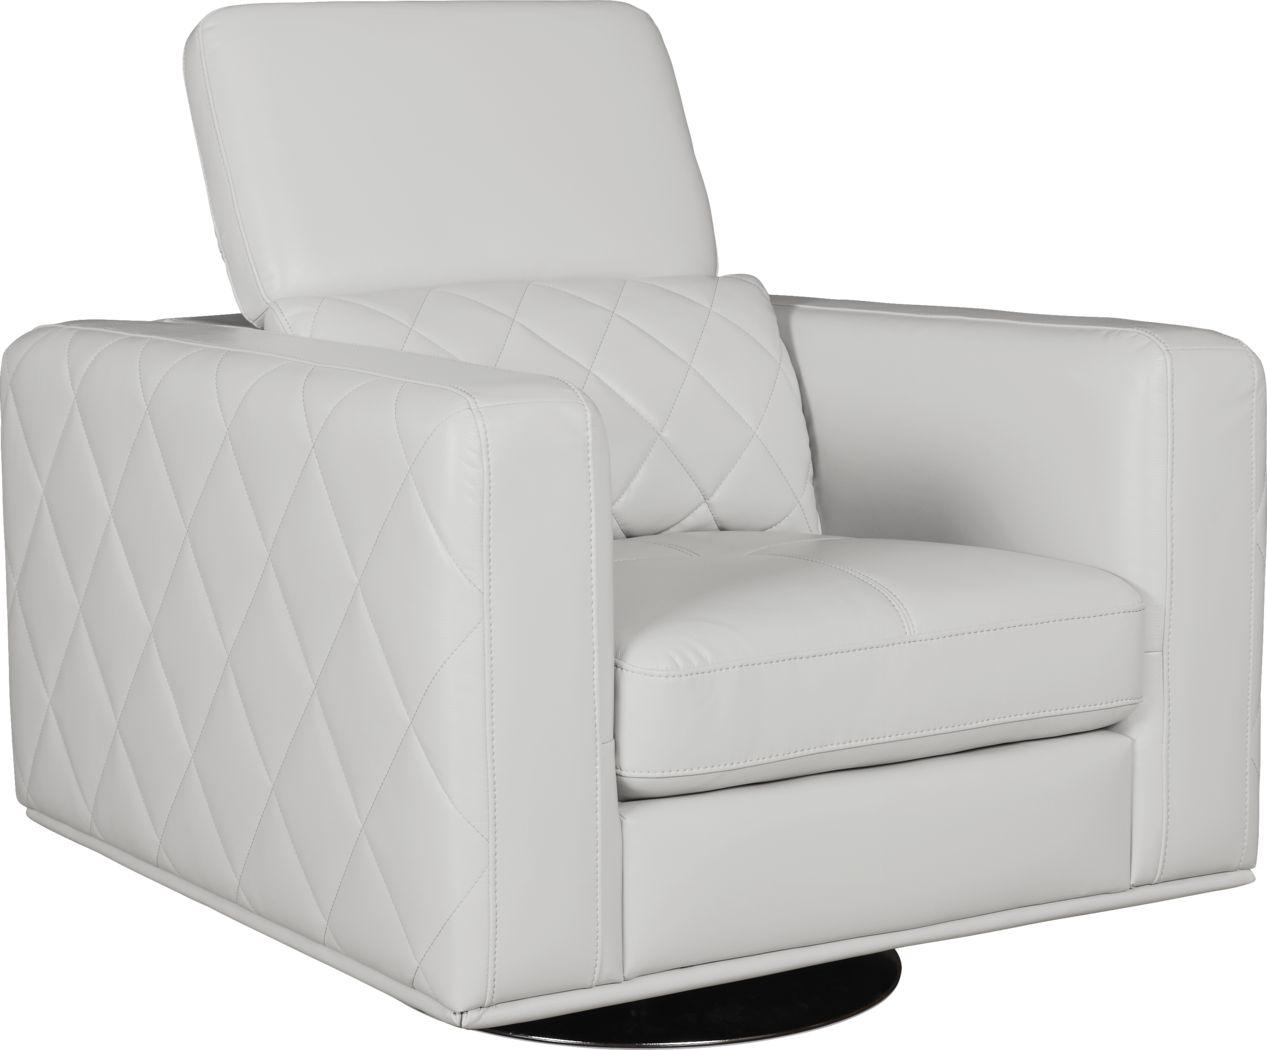 Sofia Vergara Via Sorrento White Swivel Chair